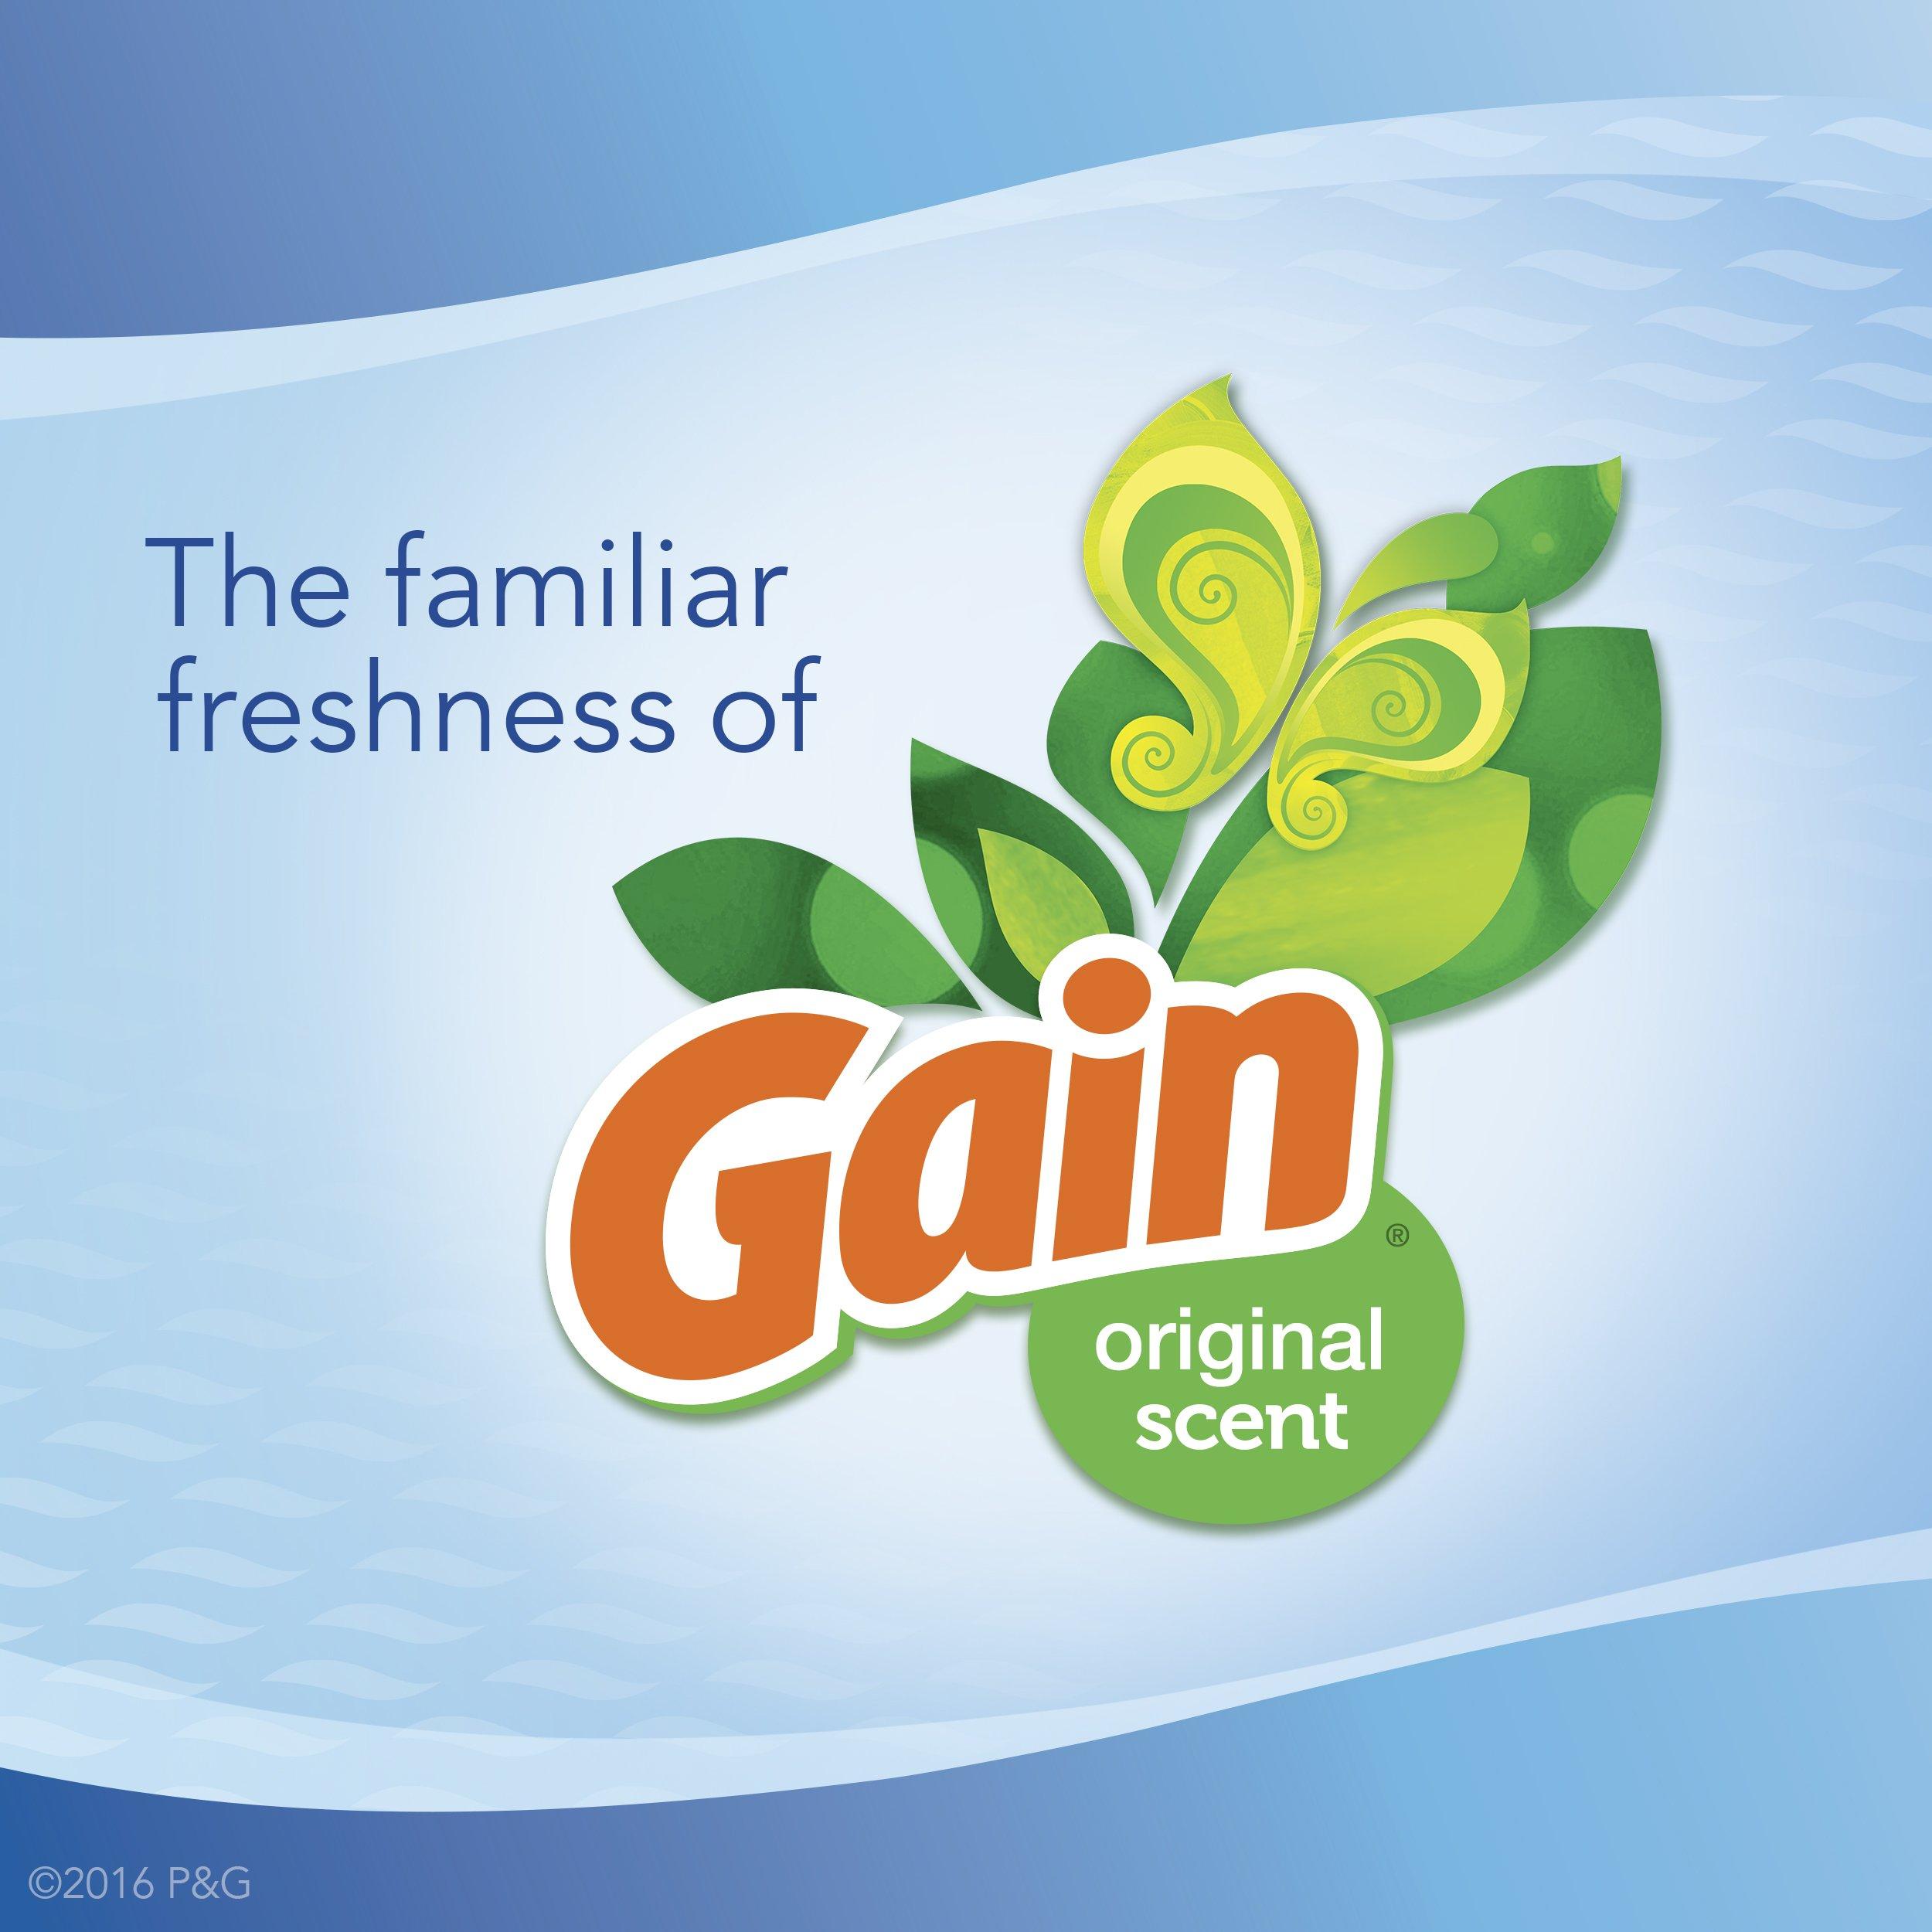 Febreze Air Freshener,  Small Spaces Air Freshener,  with Gain Original Starter Kit Air Freshener 5.5 mL(Pack of 8) by Febreze (Image #5)